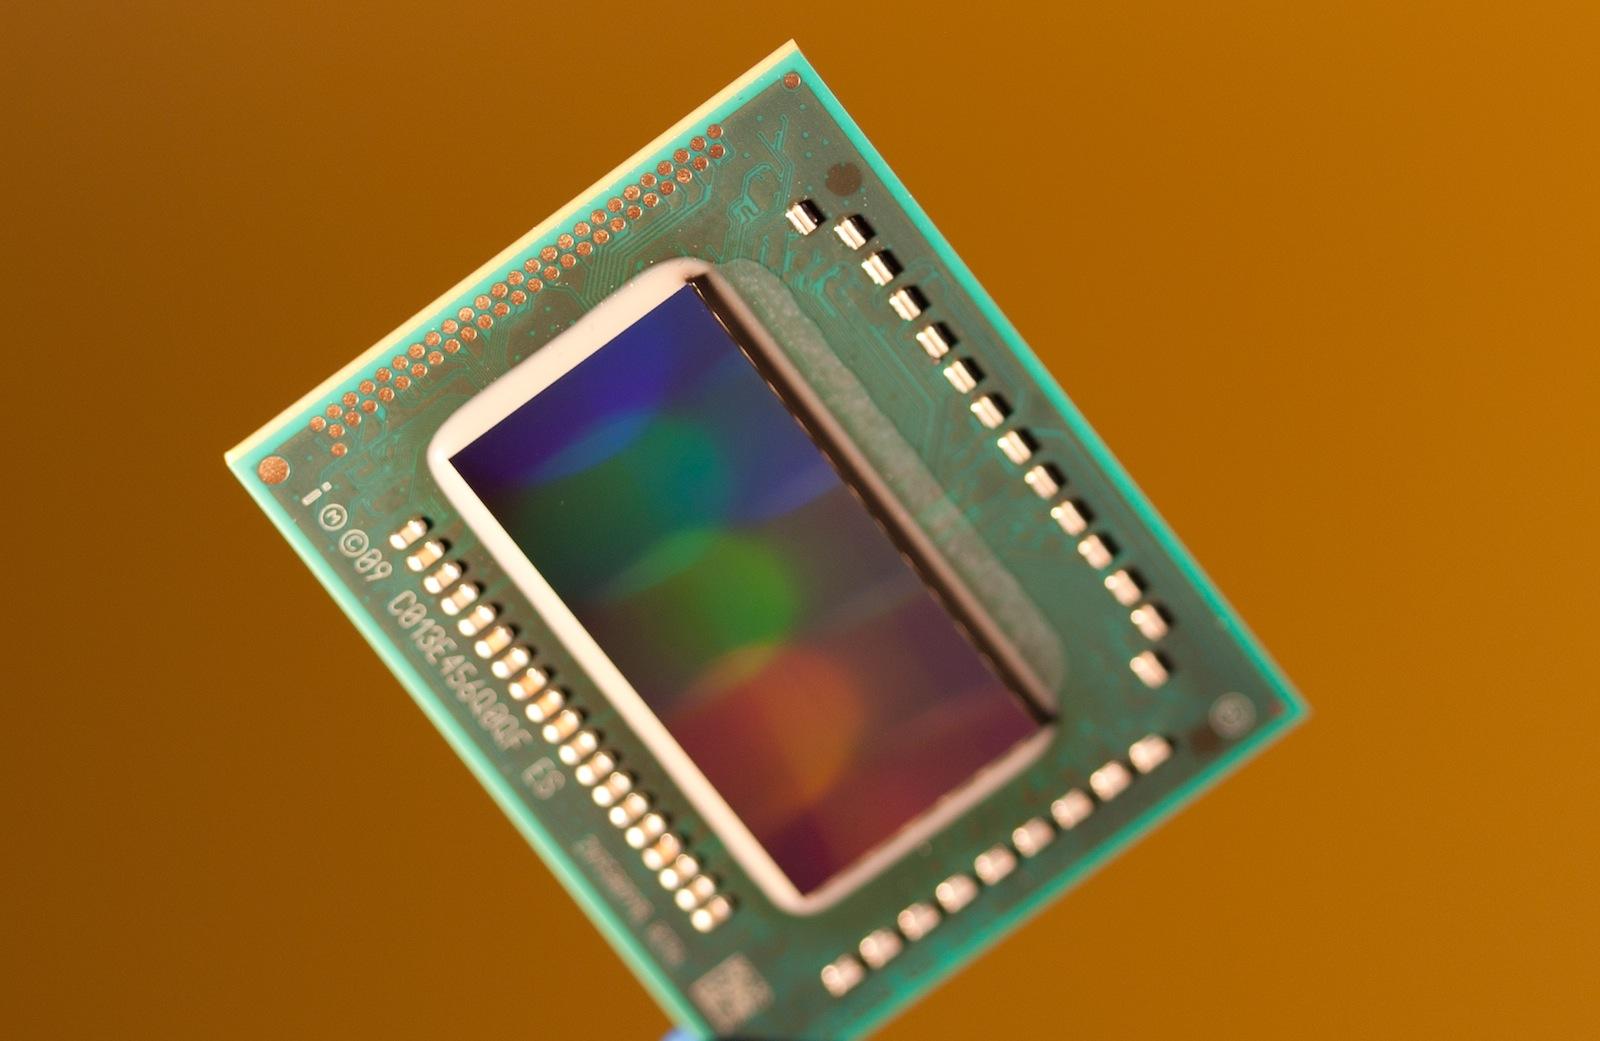 Intel Core i7-2620M vs Intel Core i7-2720QM